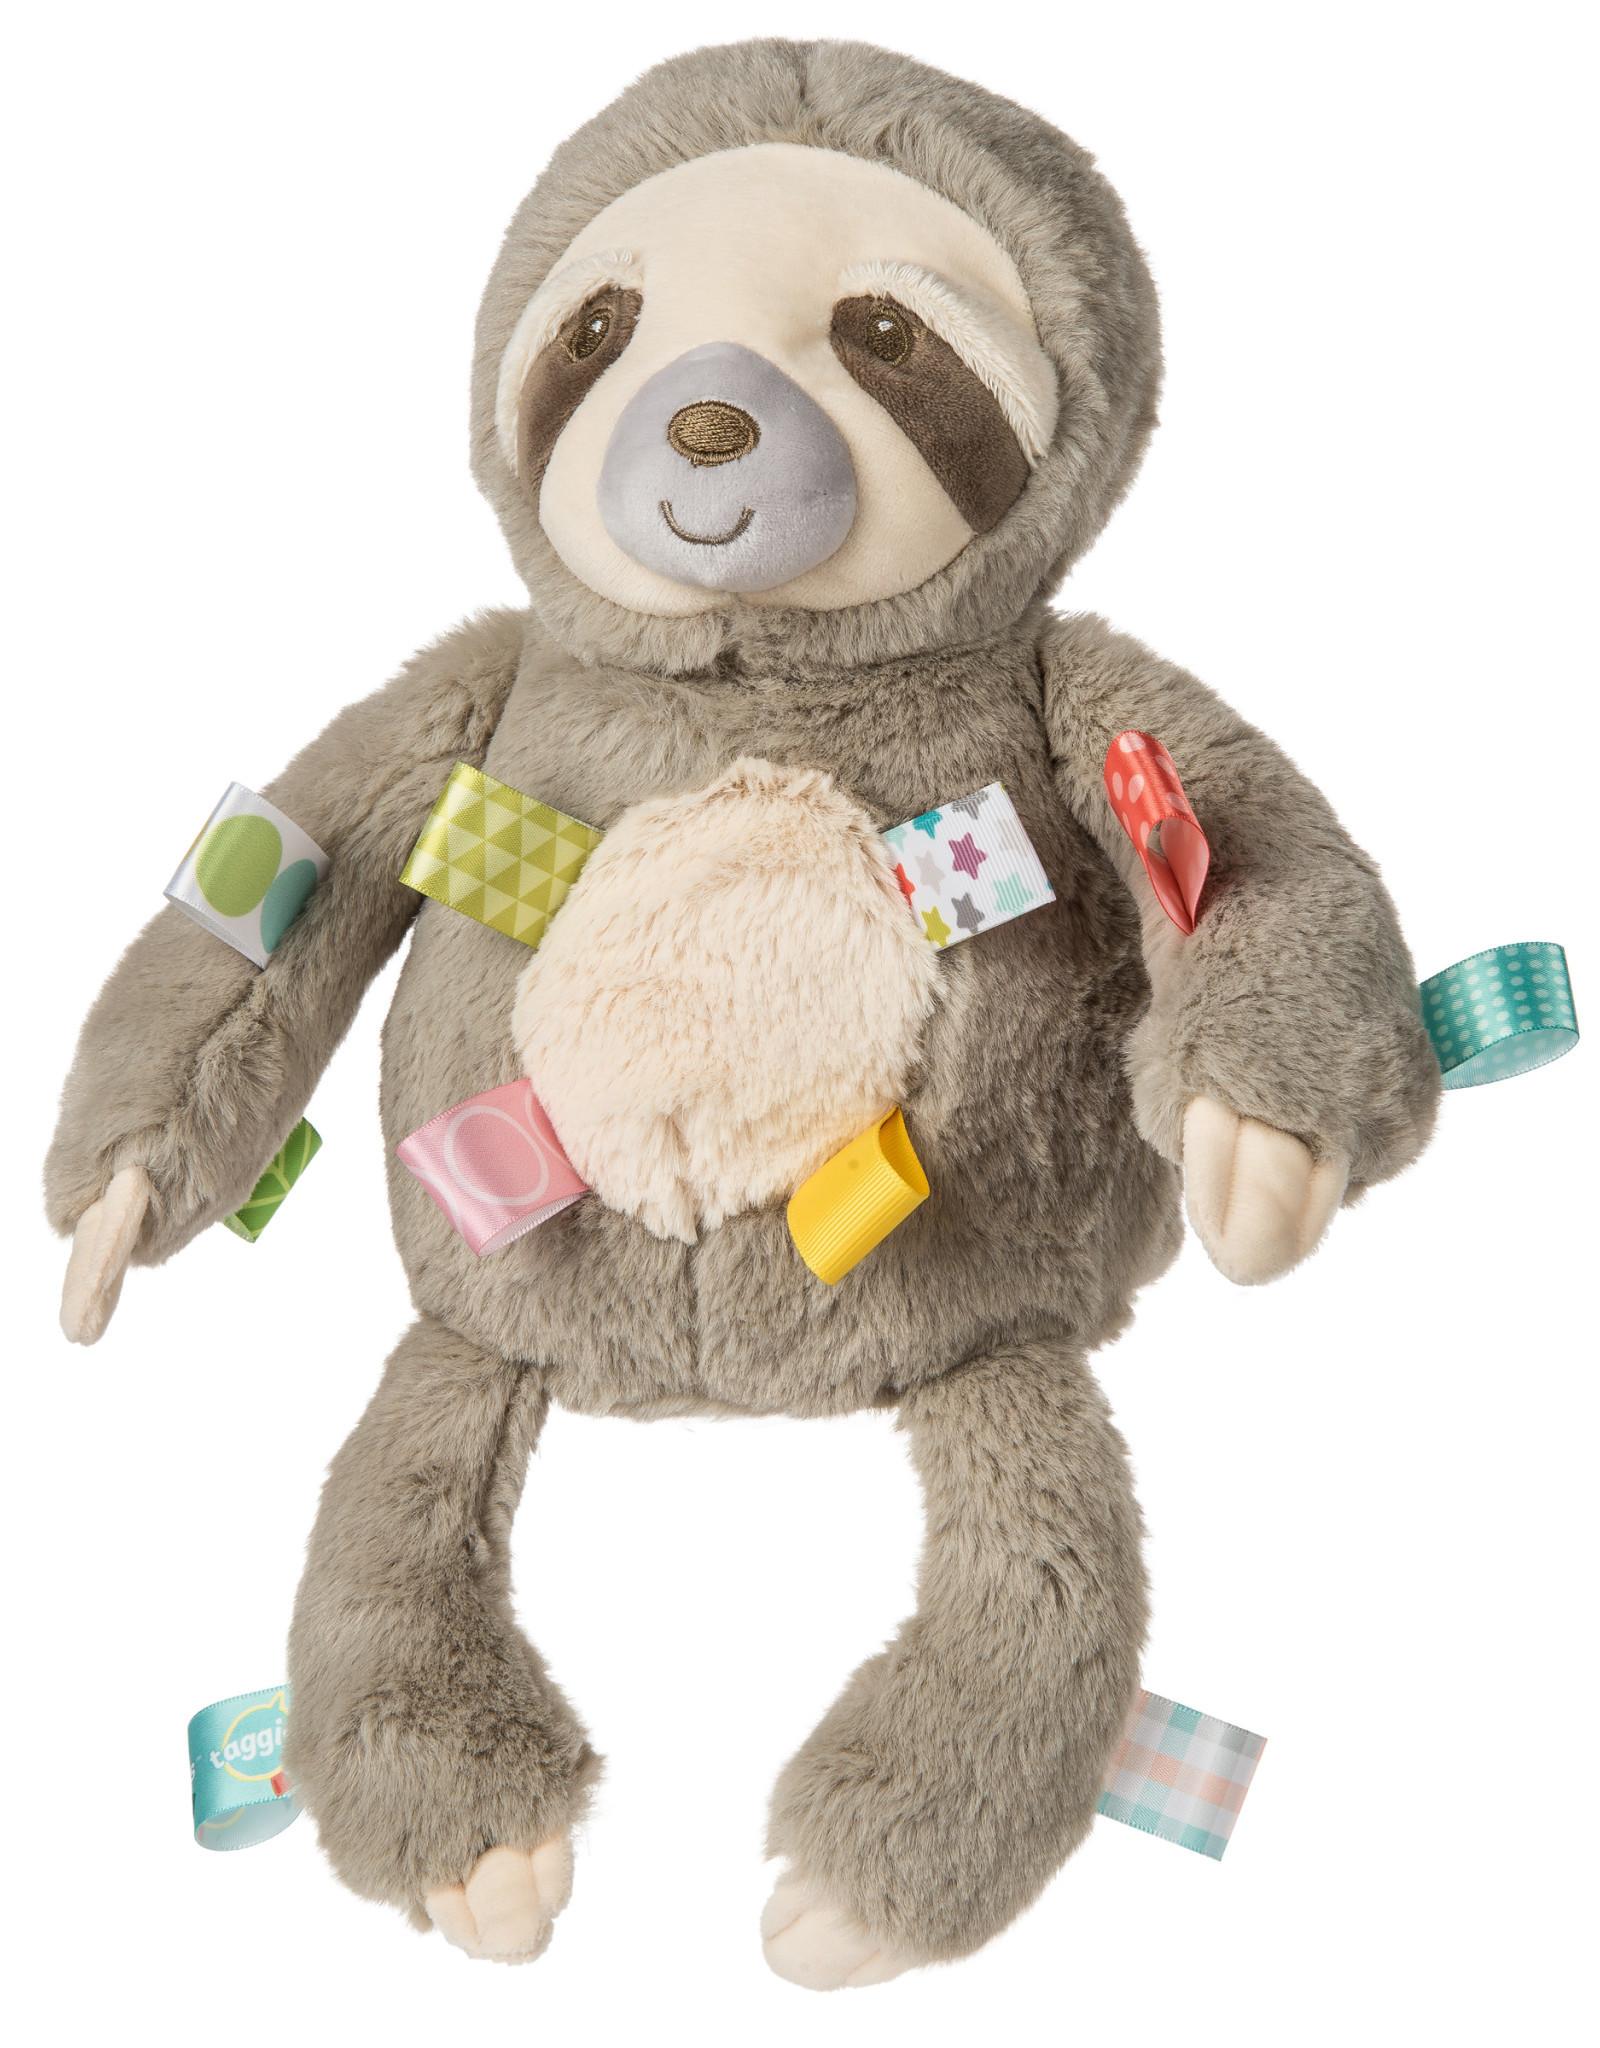 Mary Meyer Taggies Molasses Sloth Soft Toy